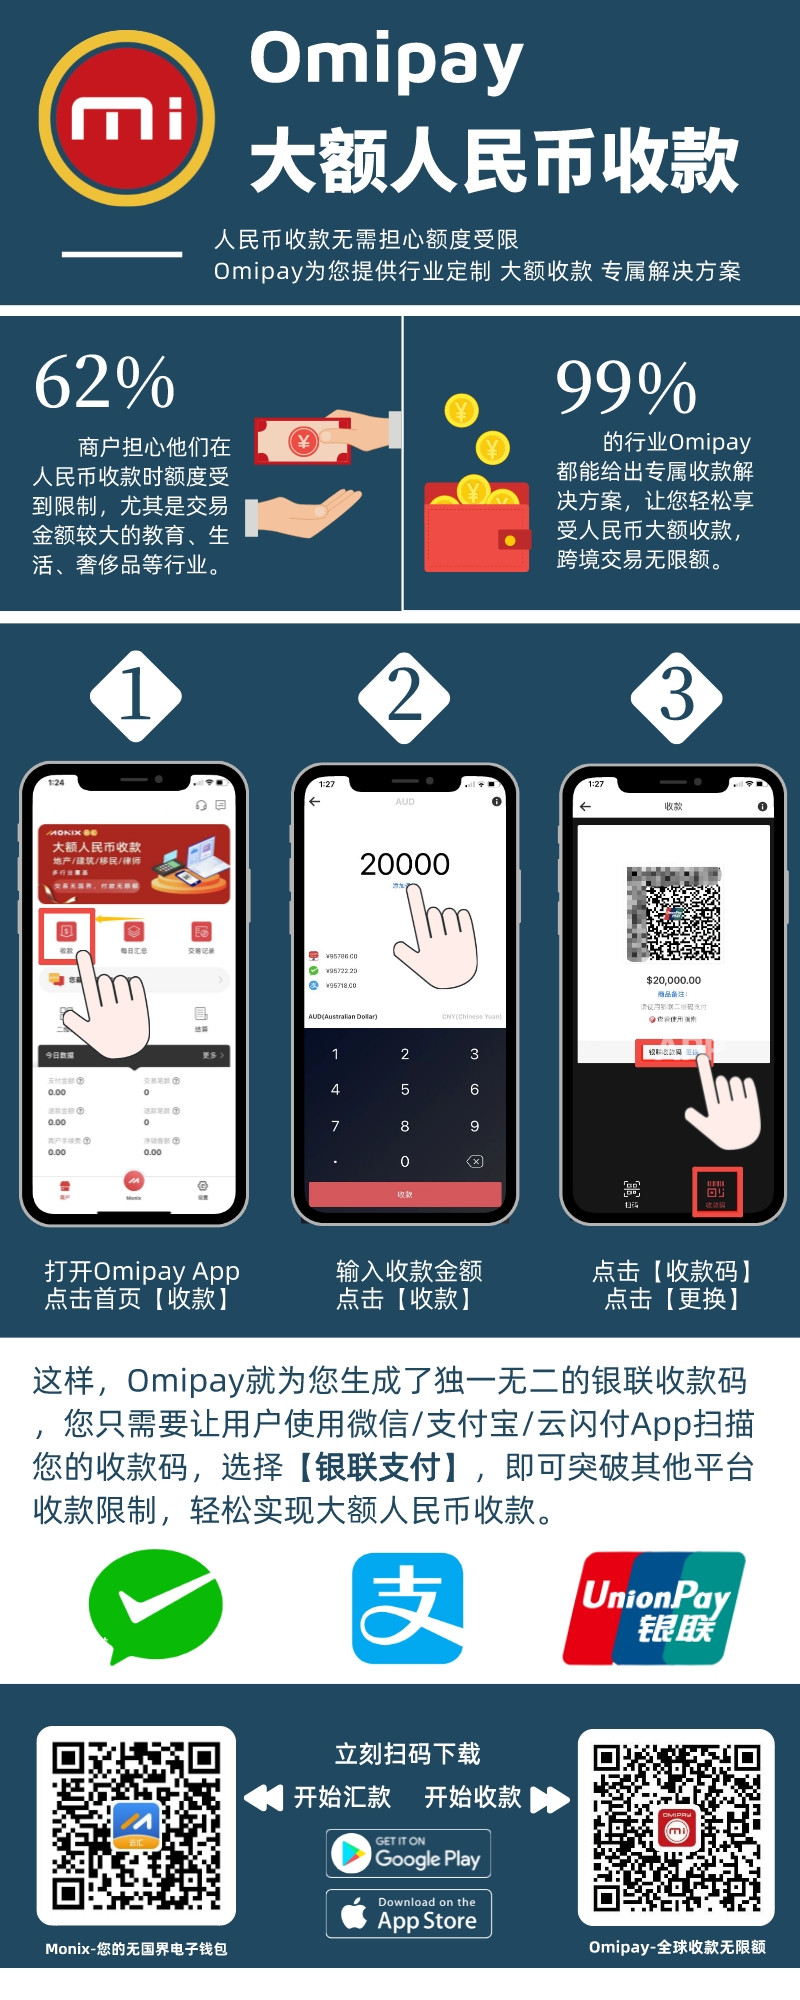 Omipay 跨境收款无限额